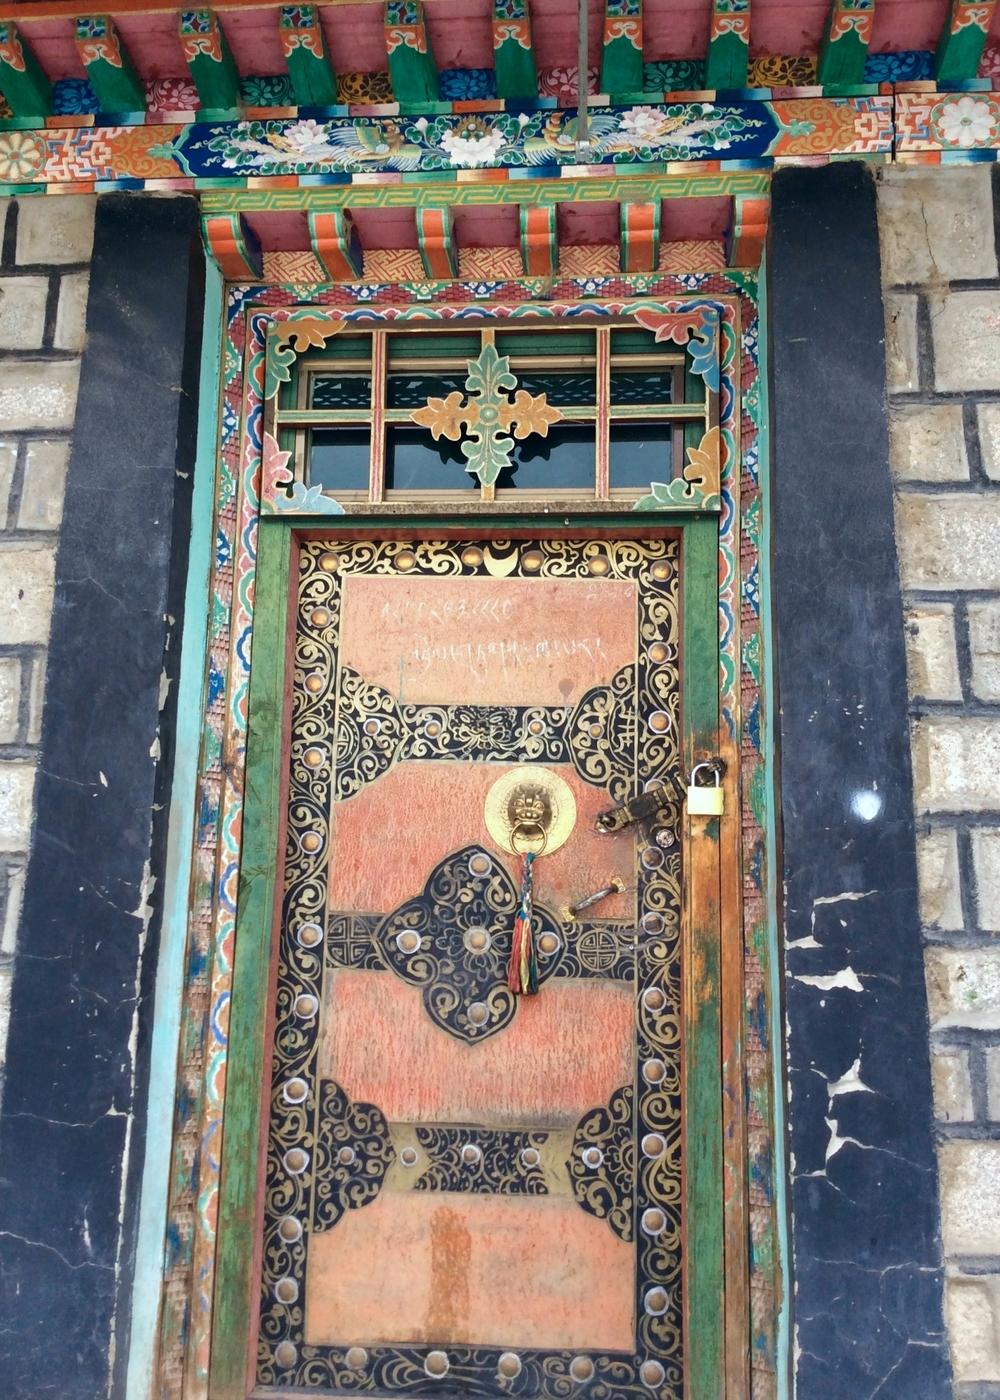 Decorative Window Grate, Samye